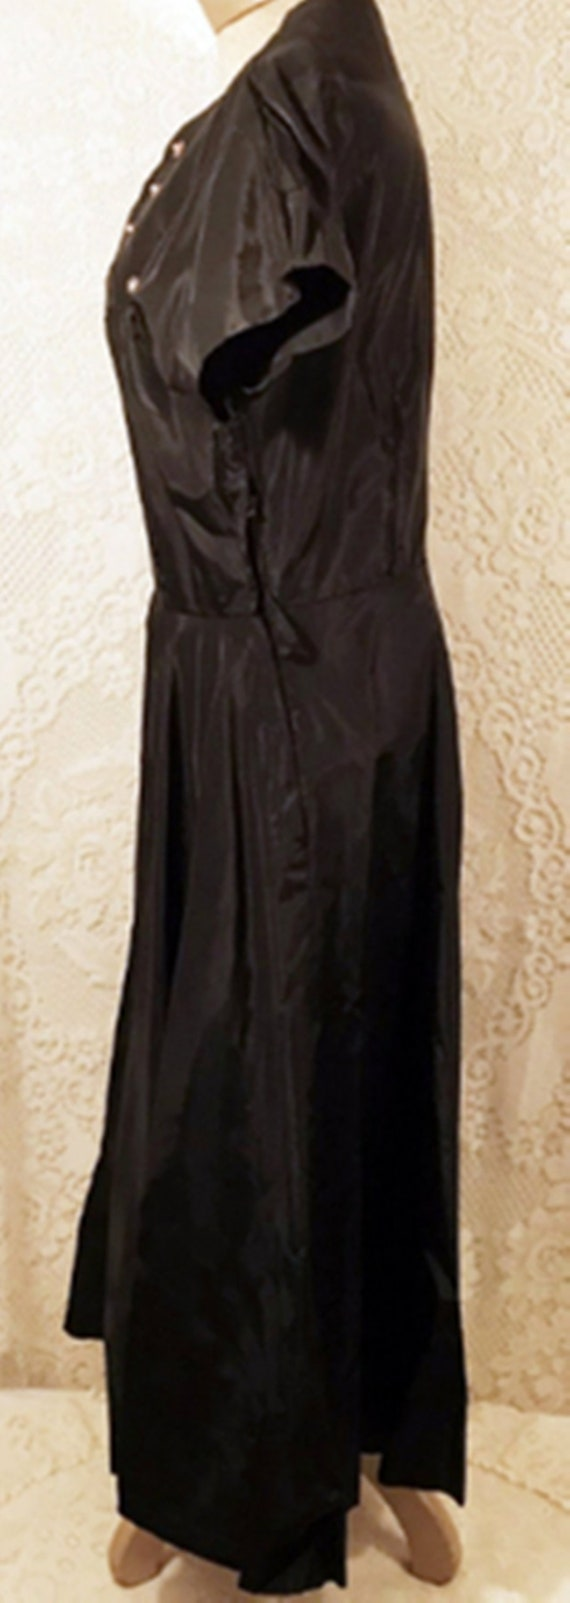 50's Dress | 50's Black Satin Swing Evening or Pa… - image 5